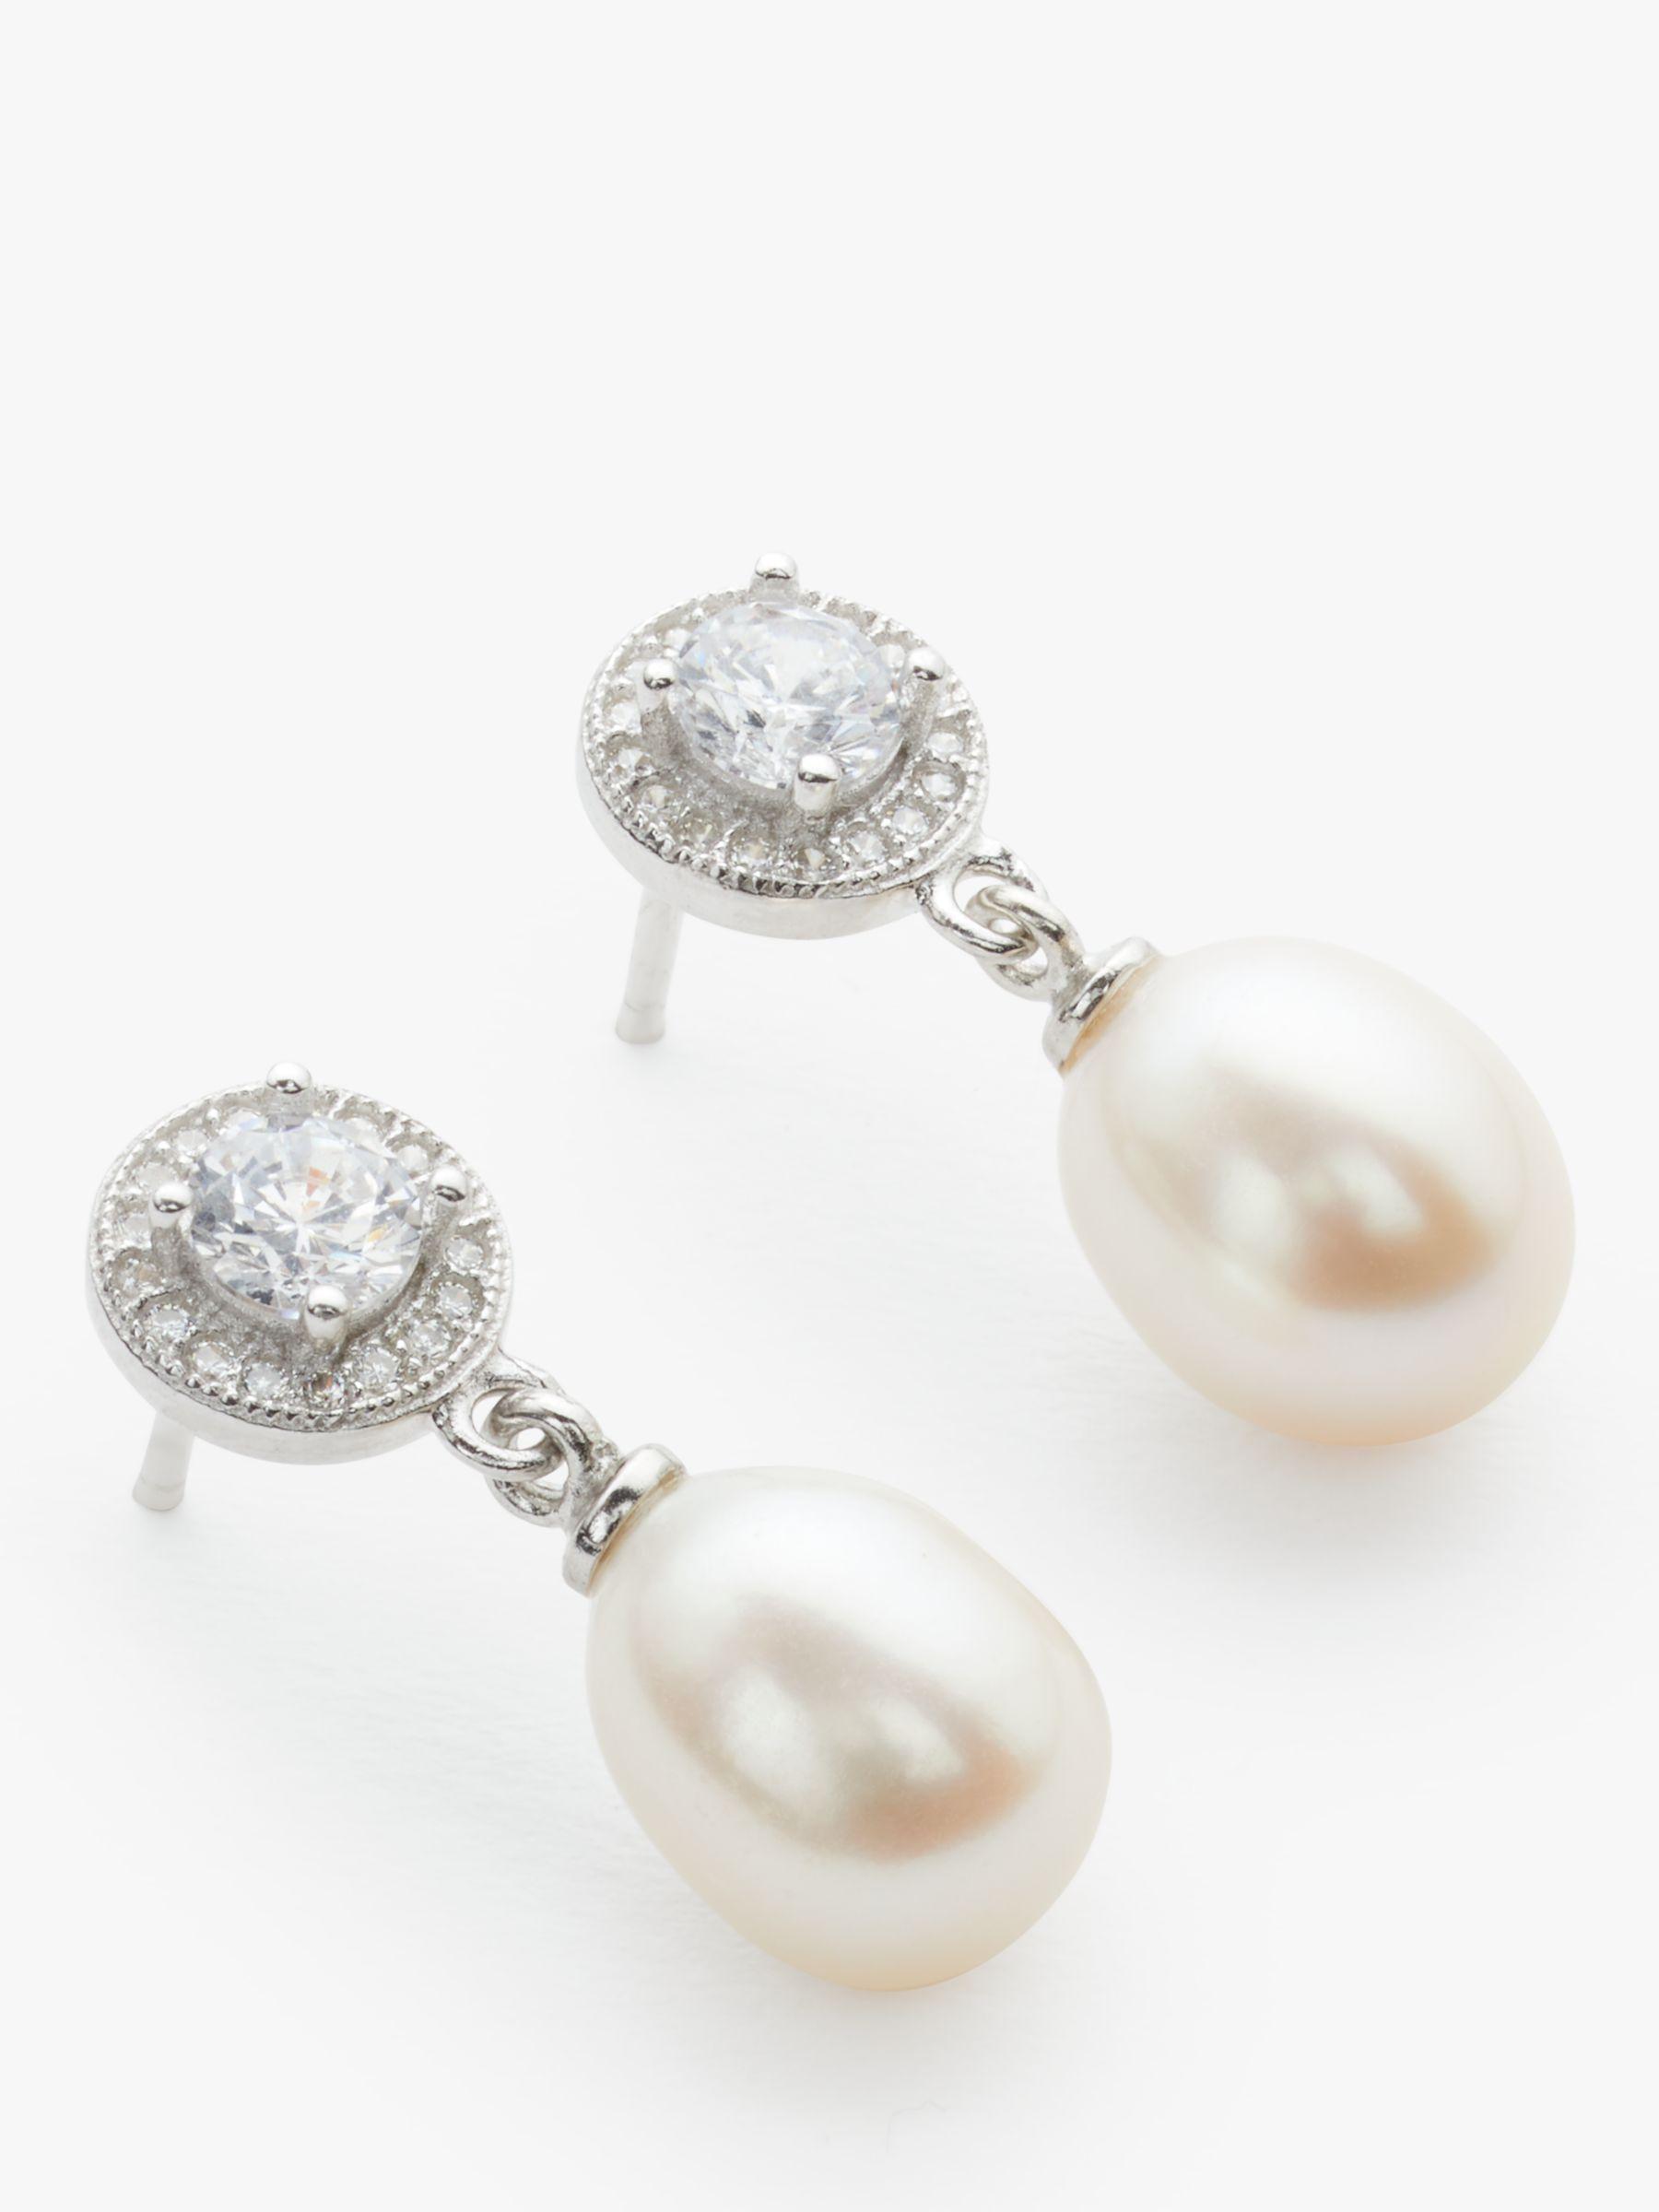 Lido Pearls Lido Pearls Circle Cubic Zirconia Freshwater Pearl Drop Earrings